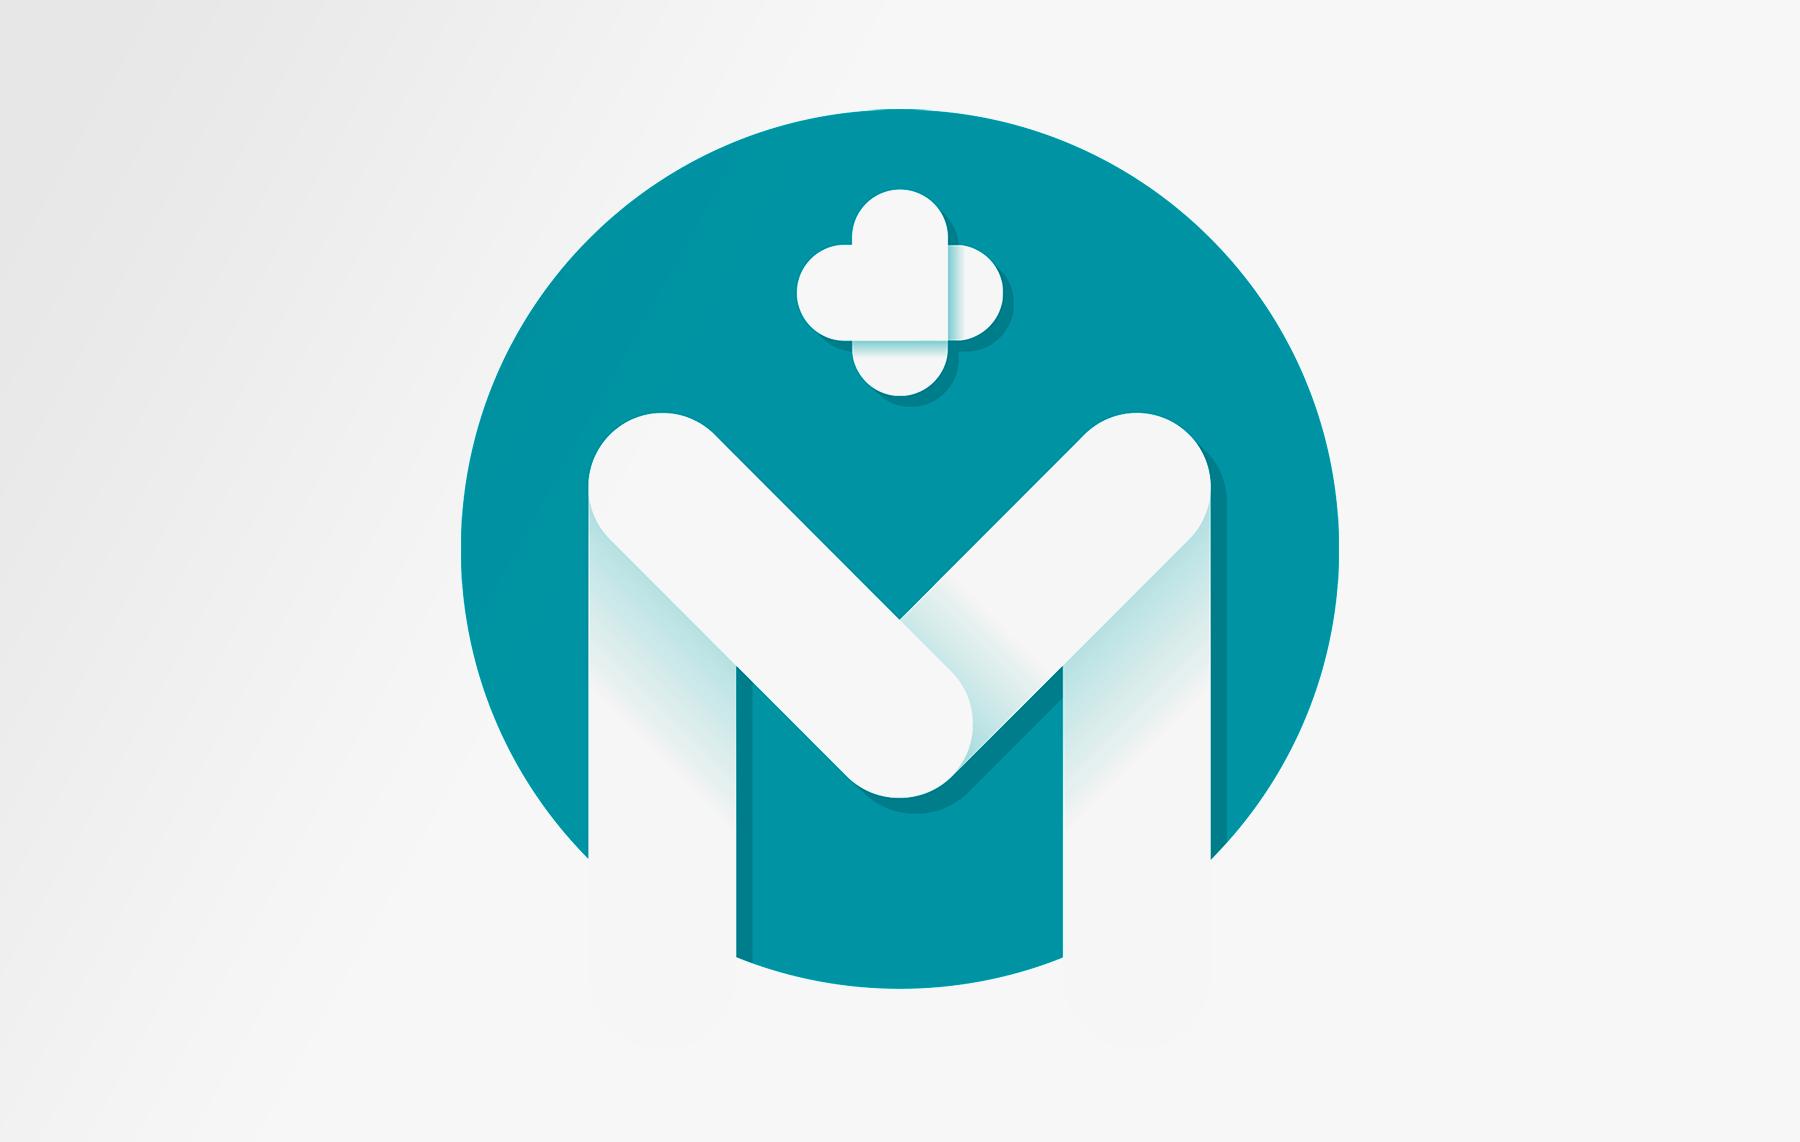 Monogramme logo médical